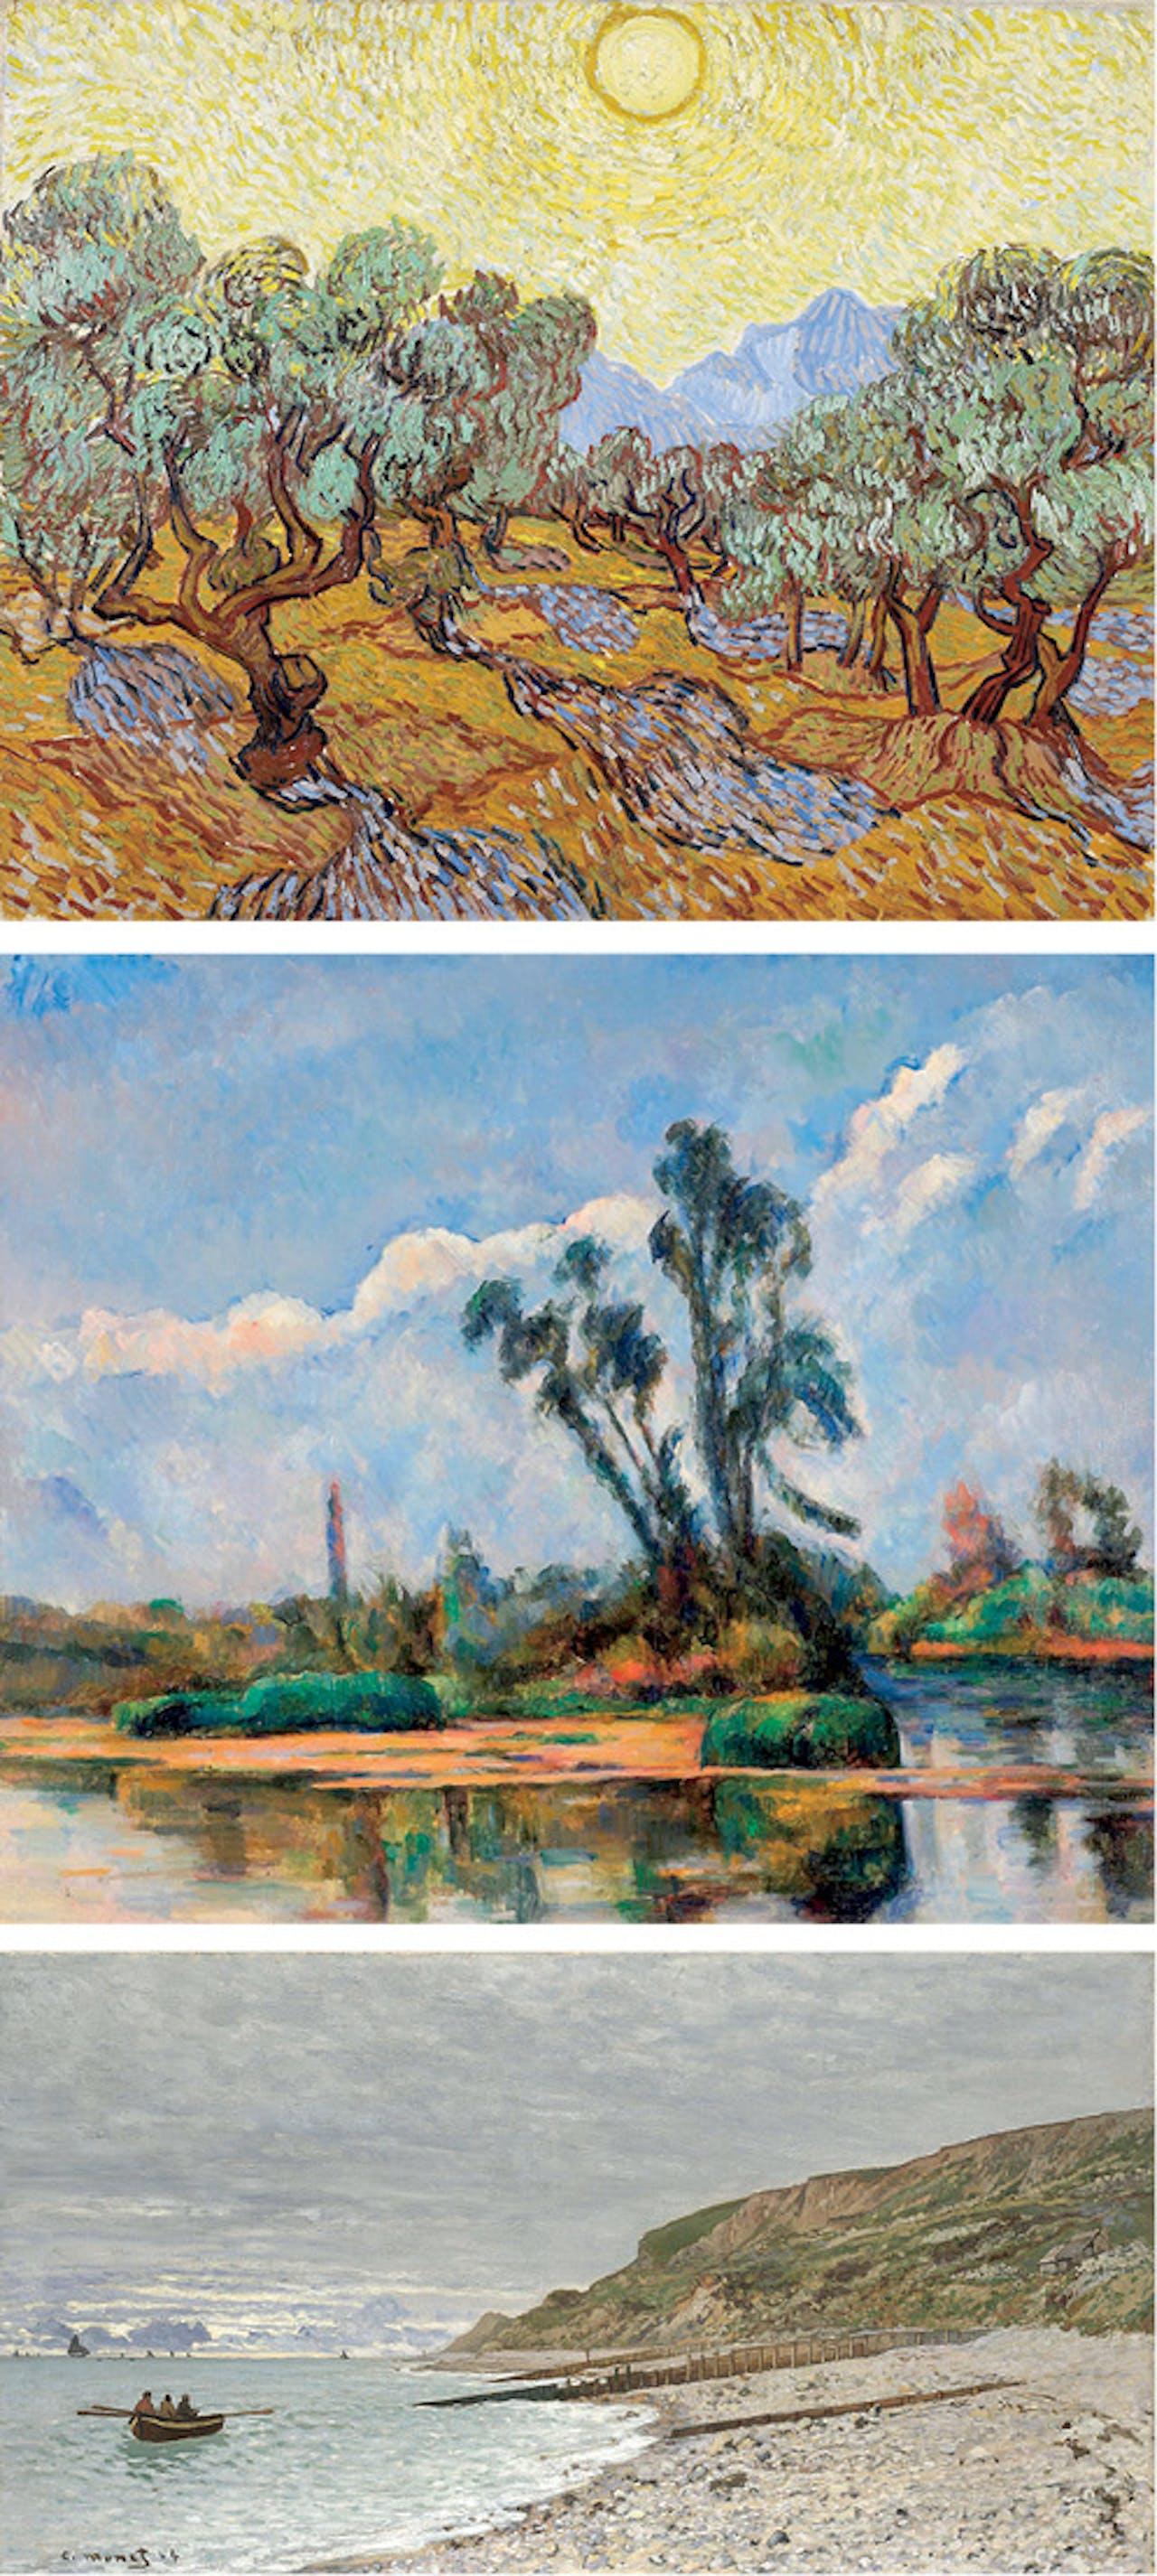 Boven: Vincent van Gogh Olijfbomen,1889; Midden: Paul Cézanne Rivierlandschap, ca. 1881; Onder: Claude Monet La Pointe de la Hève, Sainte-Adresse, 1864.